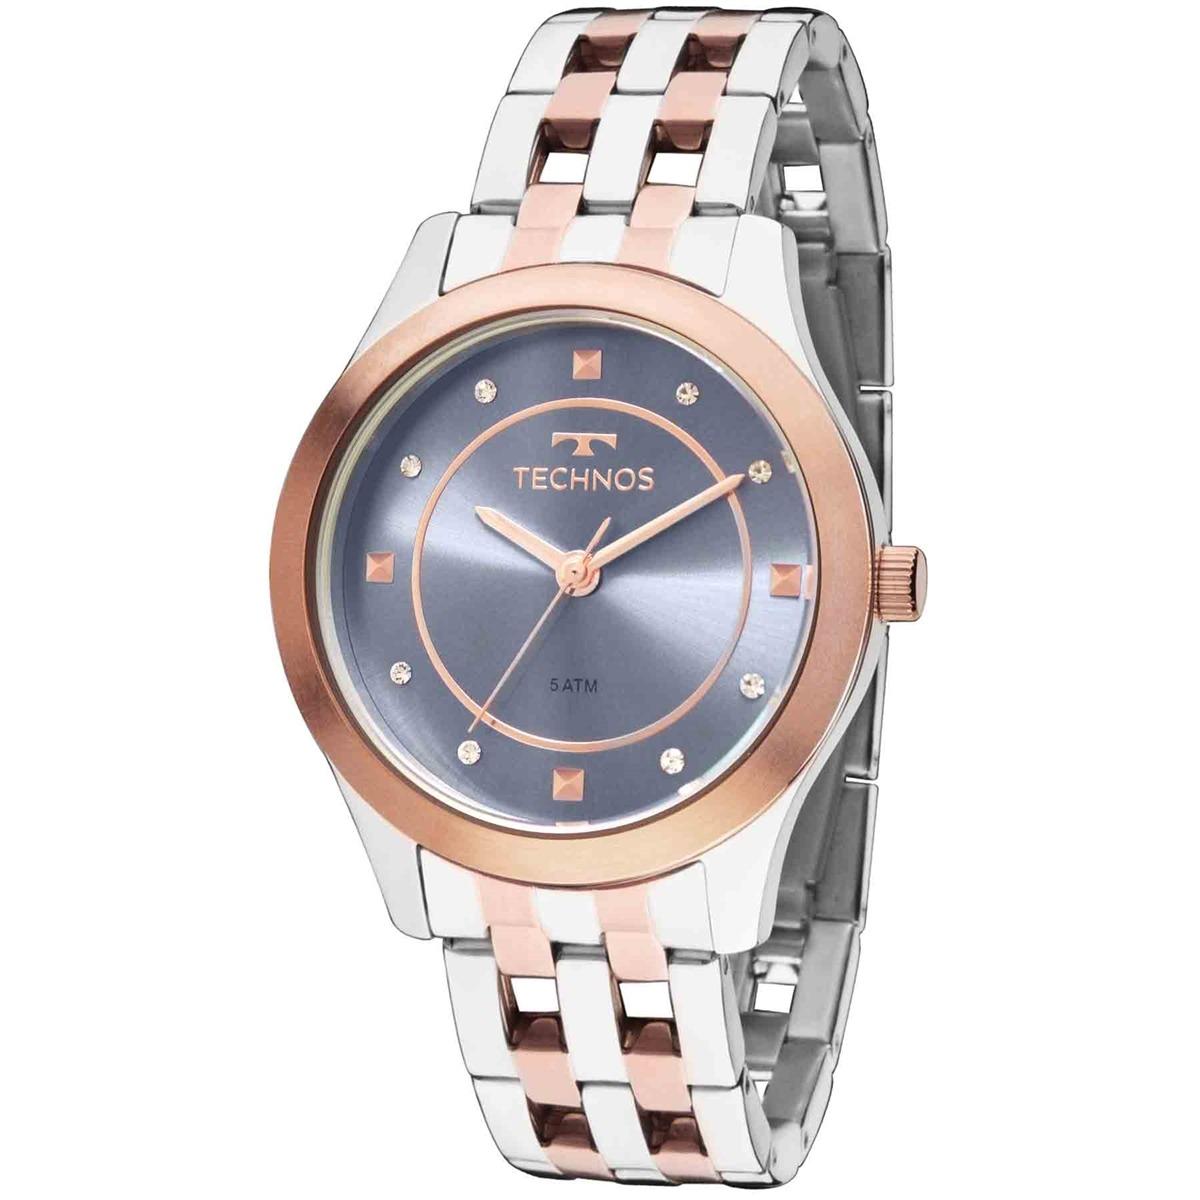 Relógio Technos Eleance Dress Feminino Analógico 2036mfd 5a - R  321 ... 54b6ad90c4